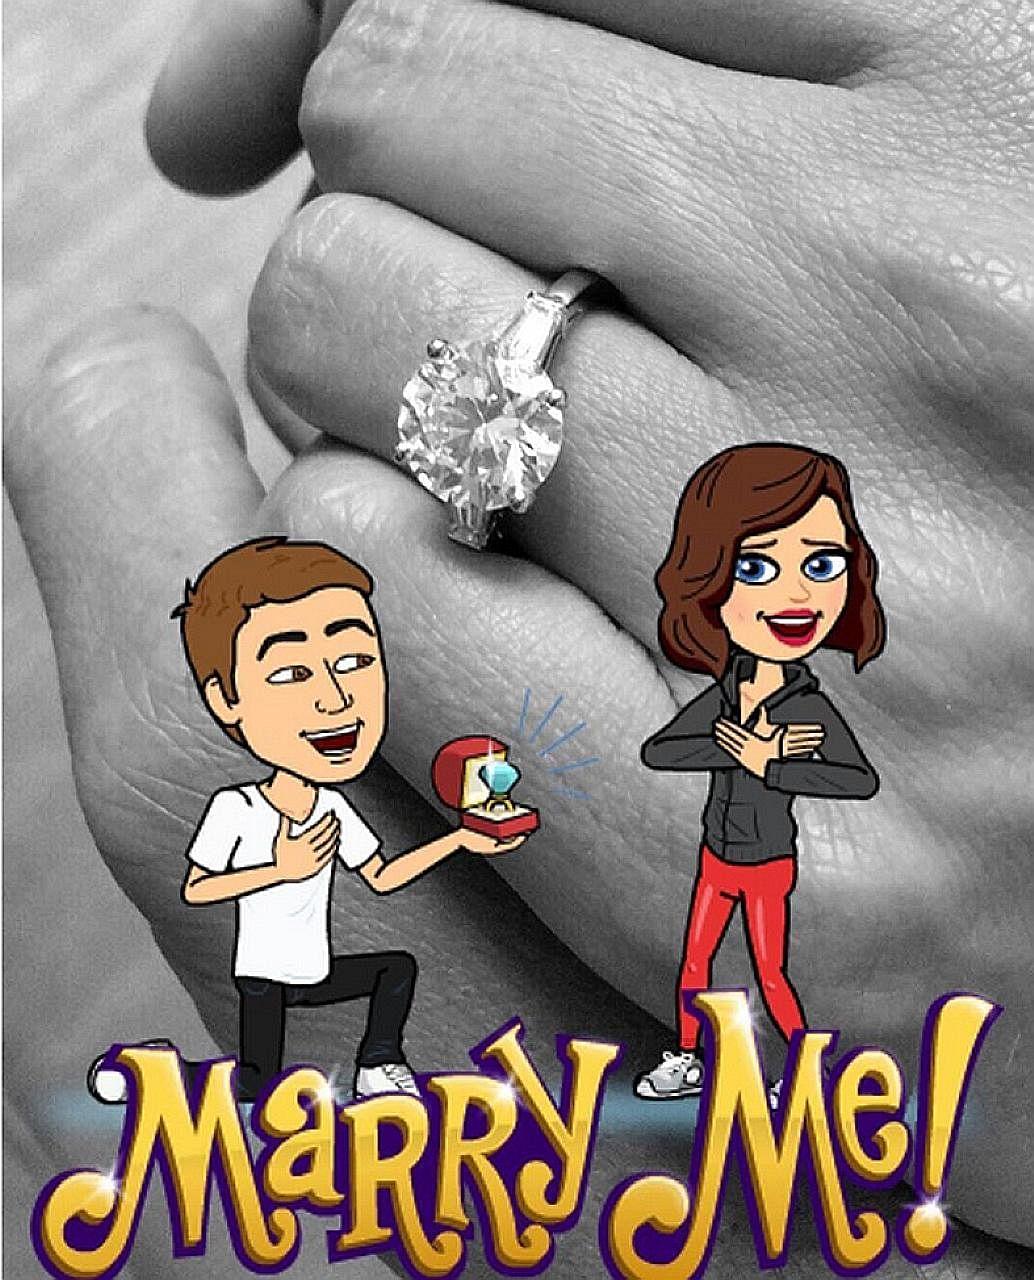 Miranda Kerr announced billionaire Evan Spiegel's (both left) proposal to her on Instagram (above).